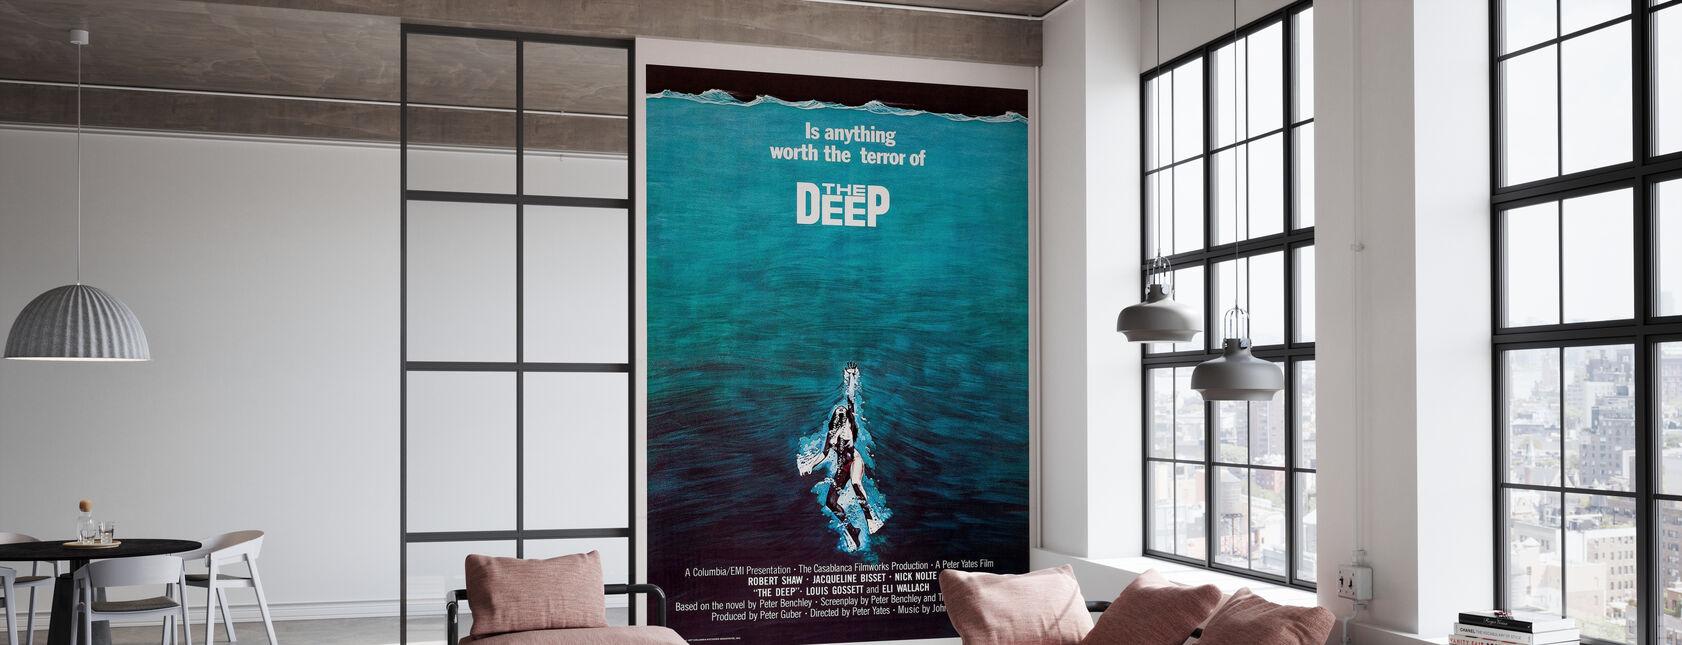 Filmposter The Terror of The Deep - Tapete - Büro